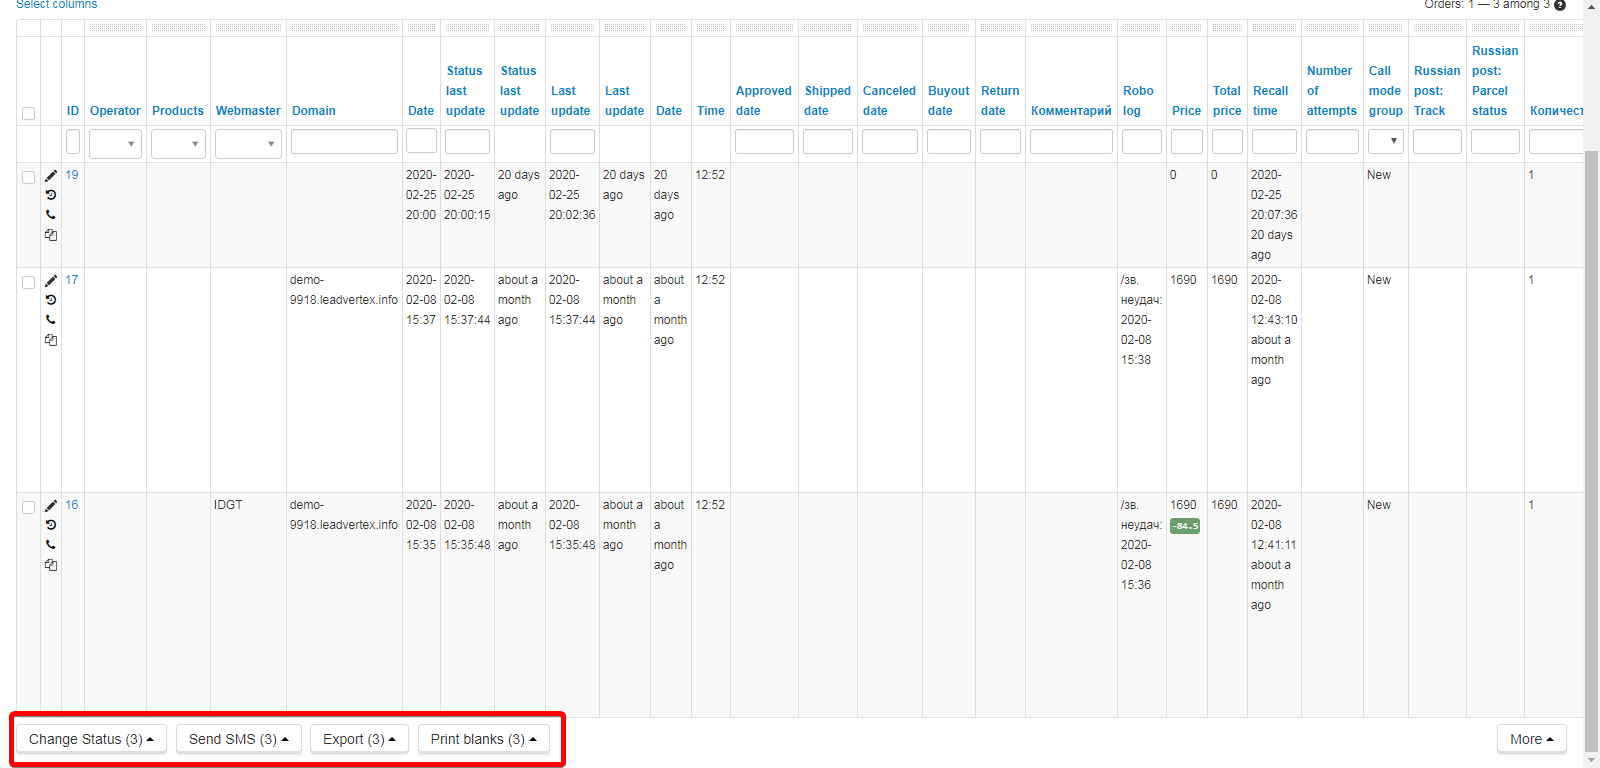 History of order edit